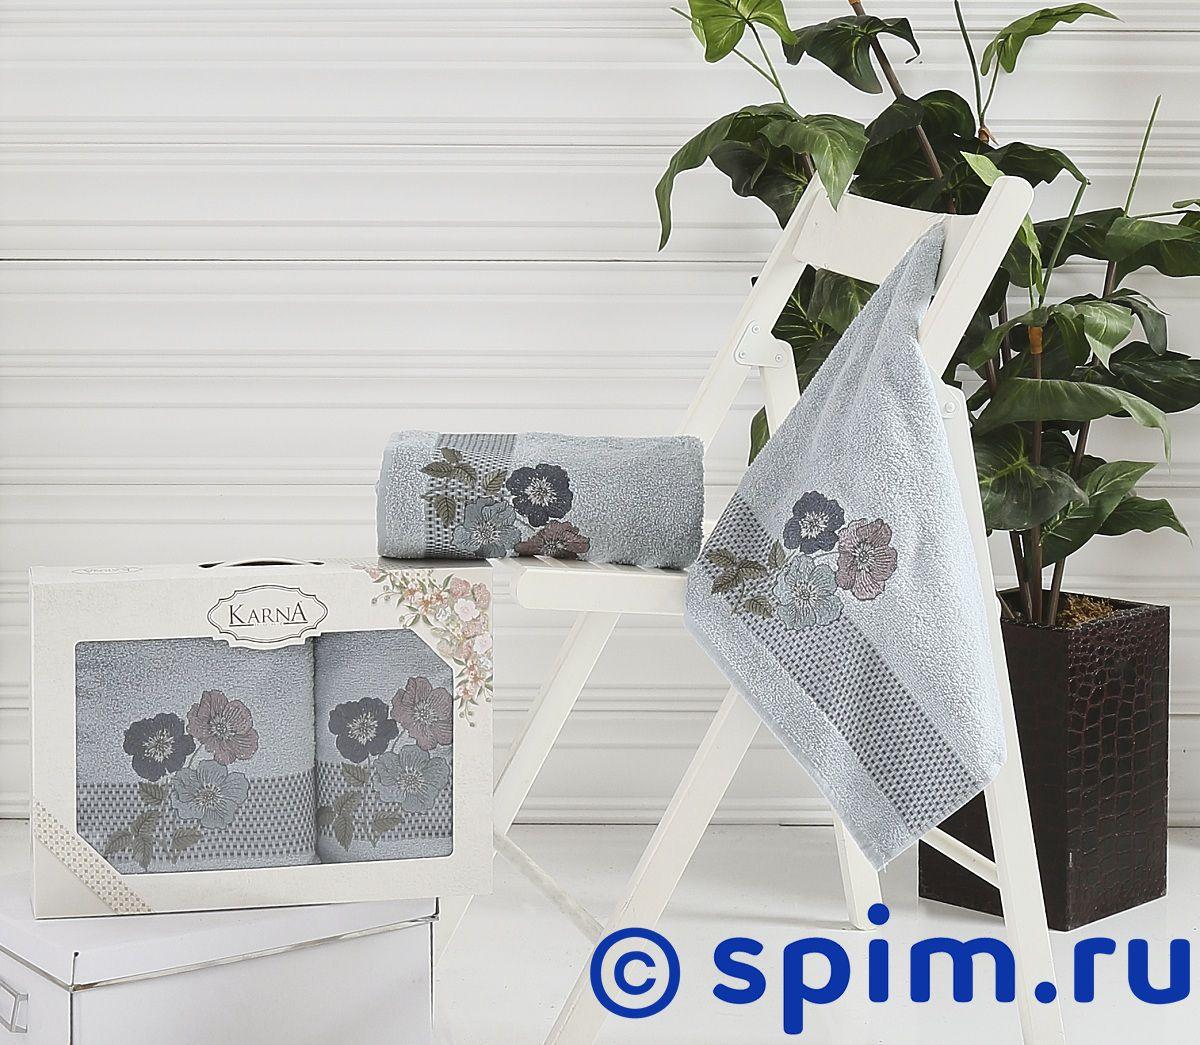 Комплект полотенец Karna Sandy, стоне арт. 2390/char005 покрывало karna rose с вышивкой стоне 160х220 см